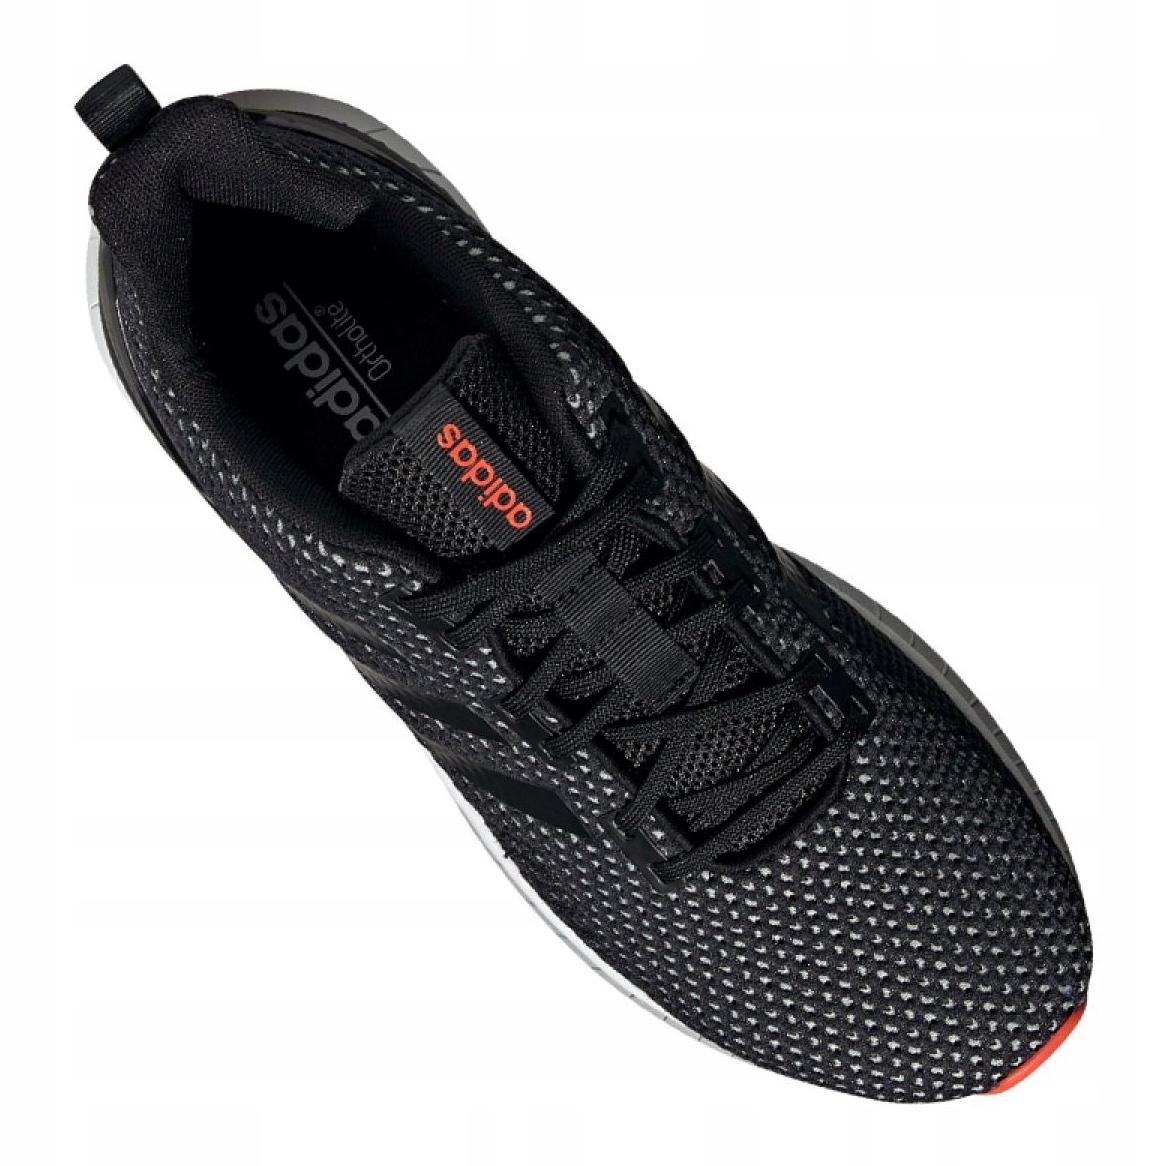 Details about Adidas Questar Tnd M F34975 shoes black